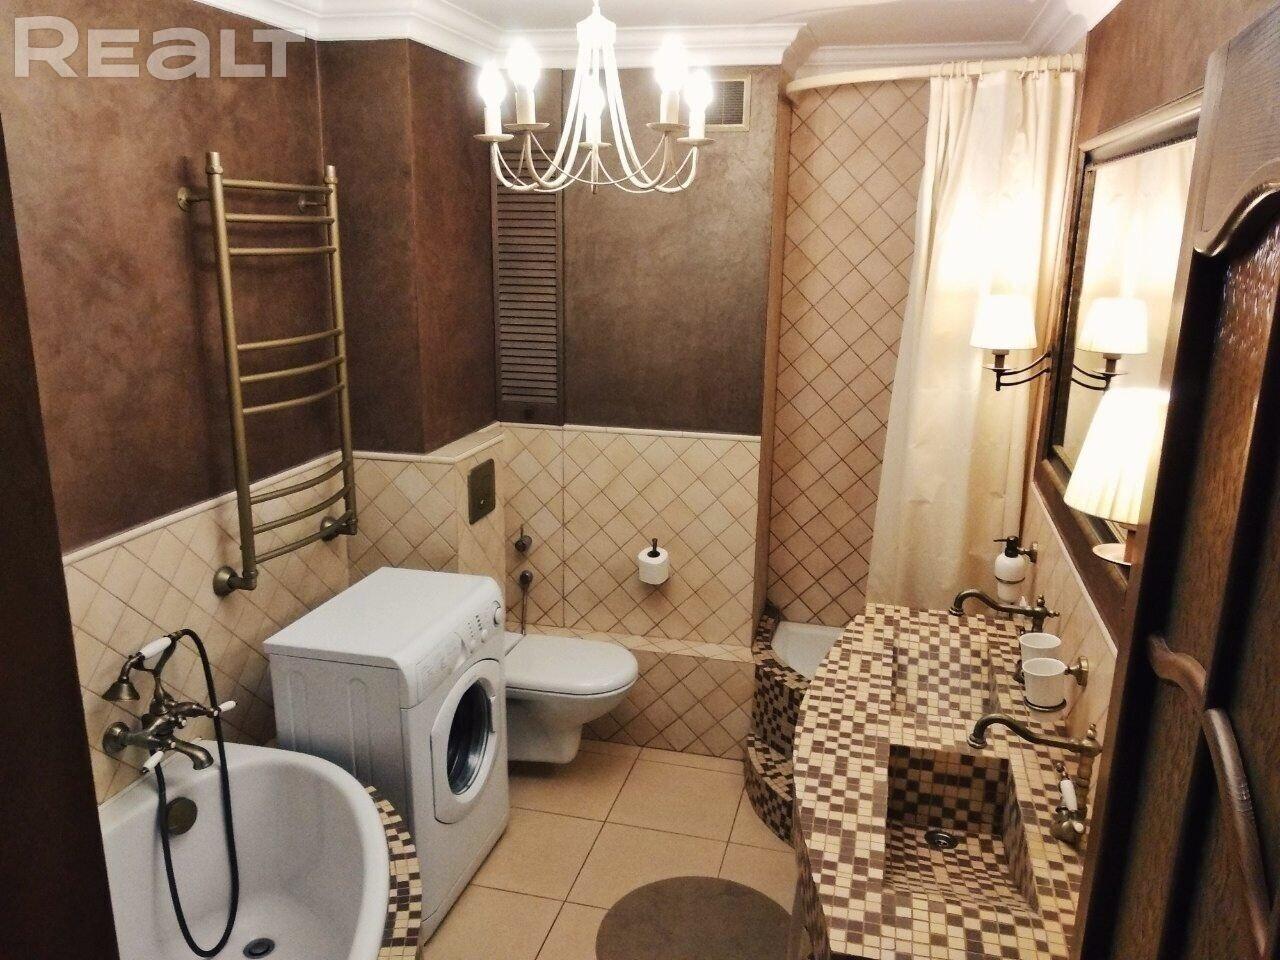 Продается 3-х комнатная квартира, Витебск - фото №15